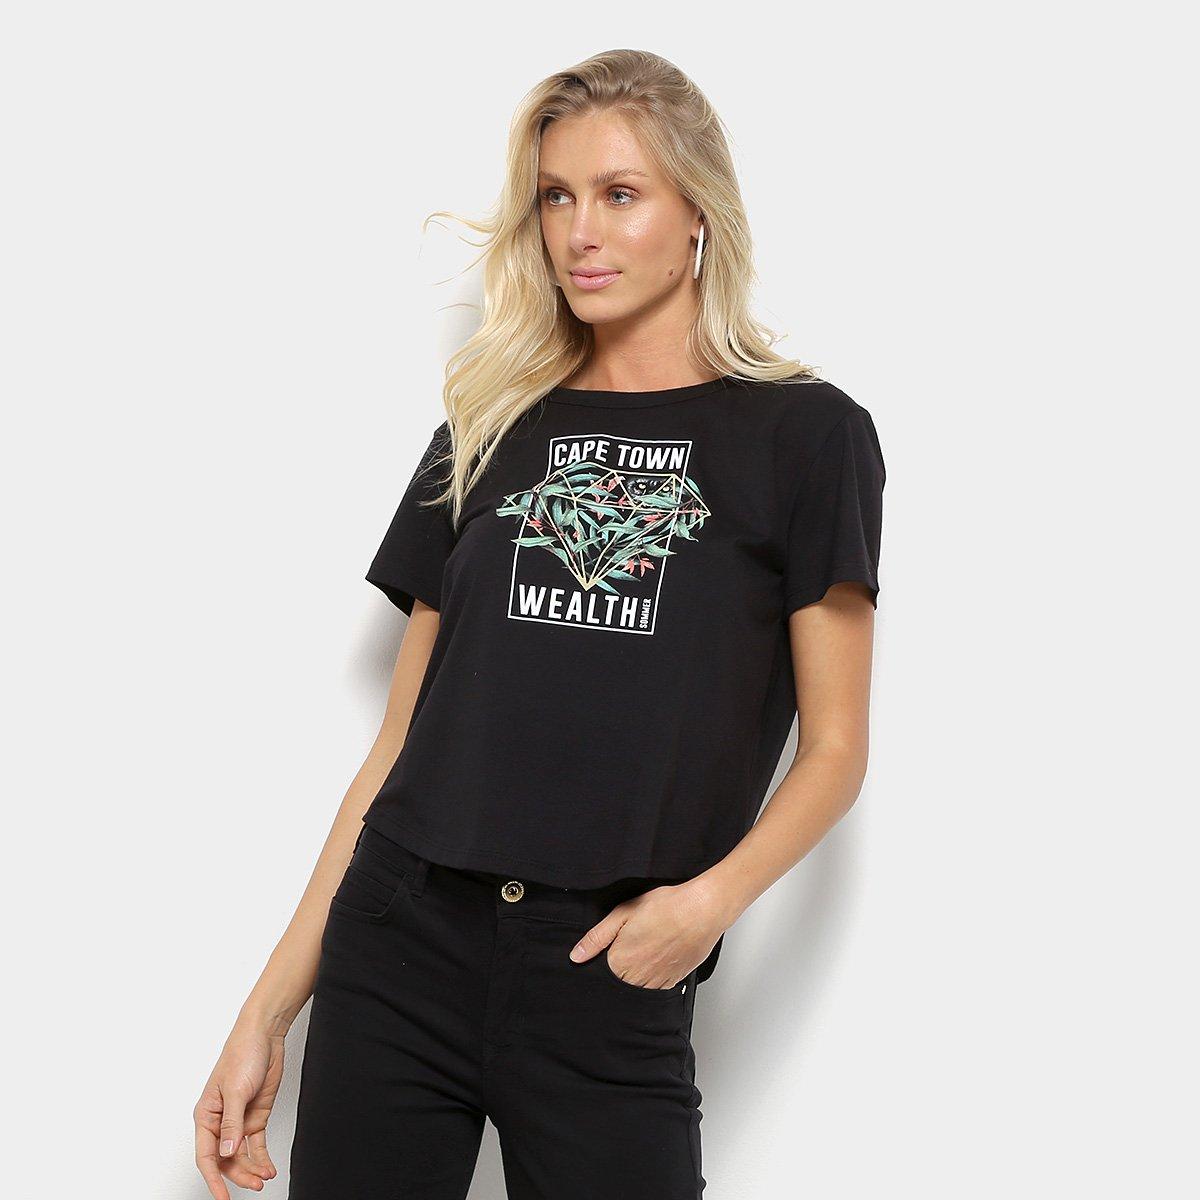 gg X-grande Roxo//Preto Nixon Asas Camiseta Manga Curta Camiseta